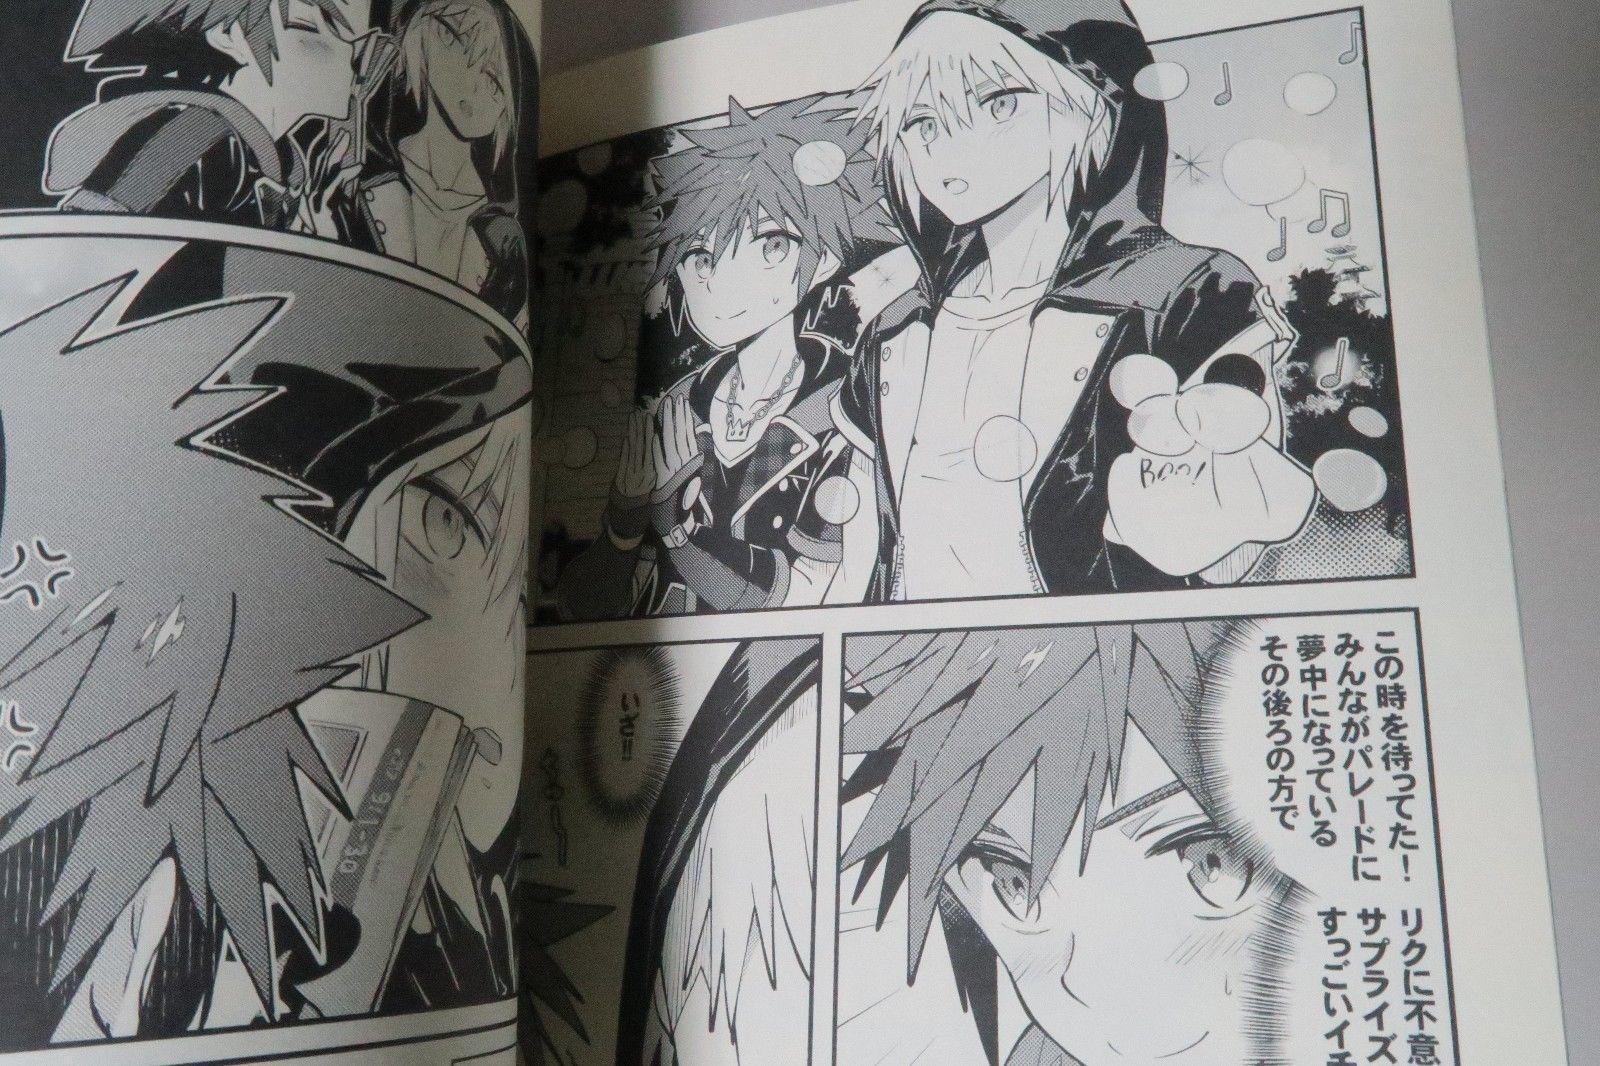 KINGDOM HEARTS doujinshi Sora X Riku B5 24page esto ALL YOU NEED IS OPPAI KH